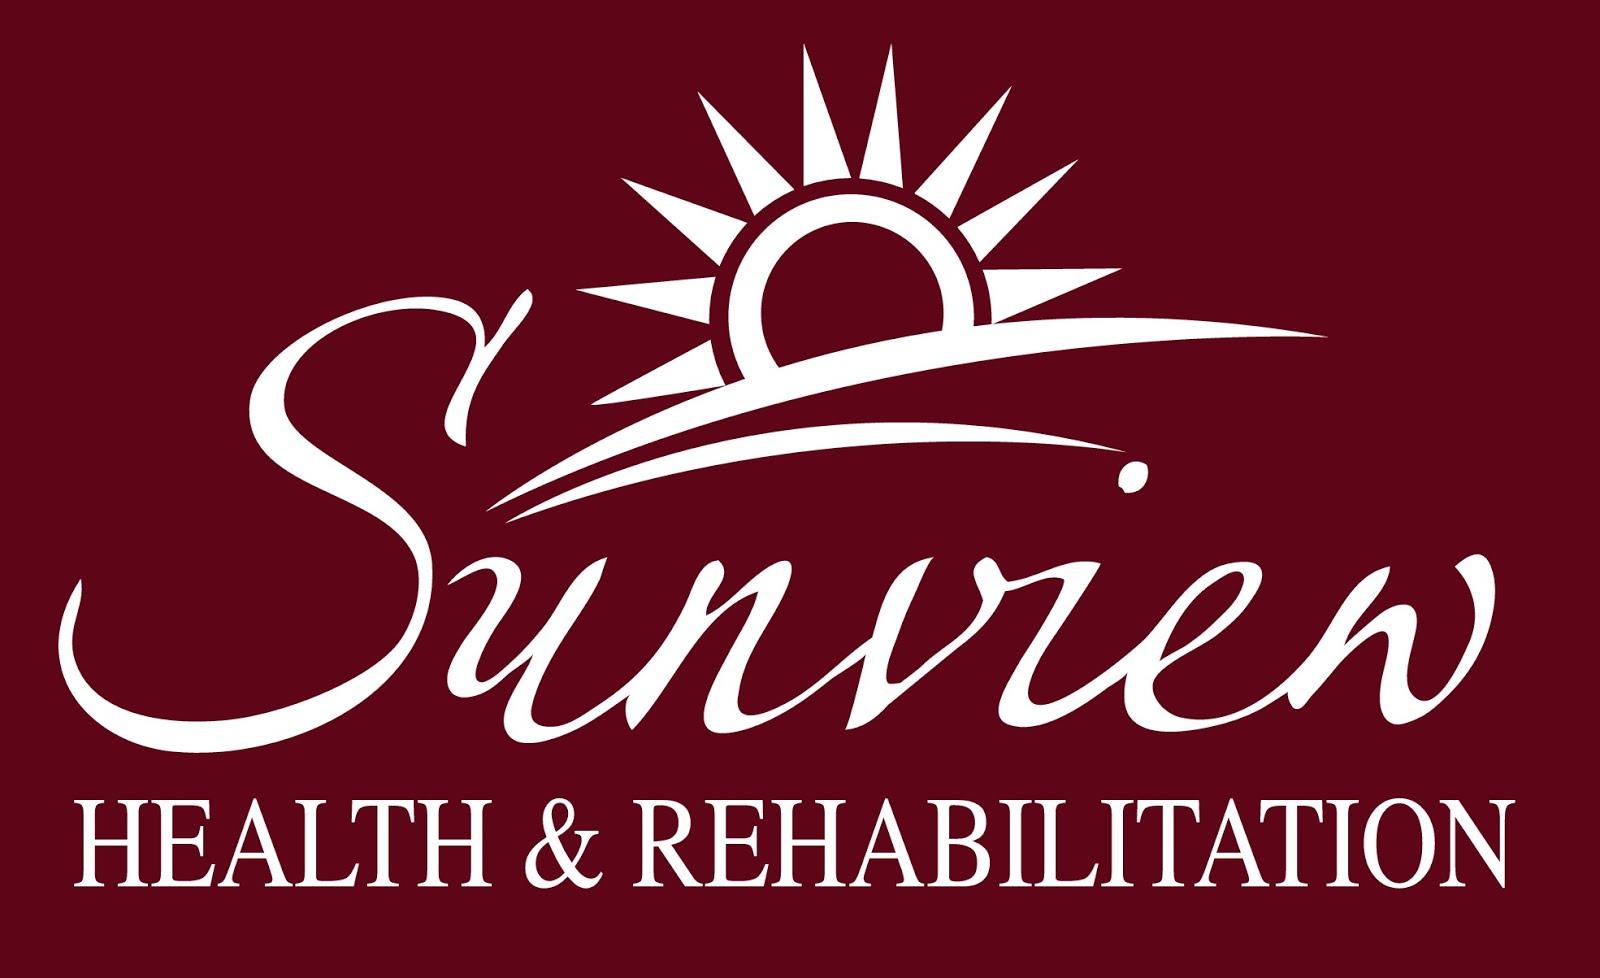 Sunview Health & Rehabilitation